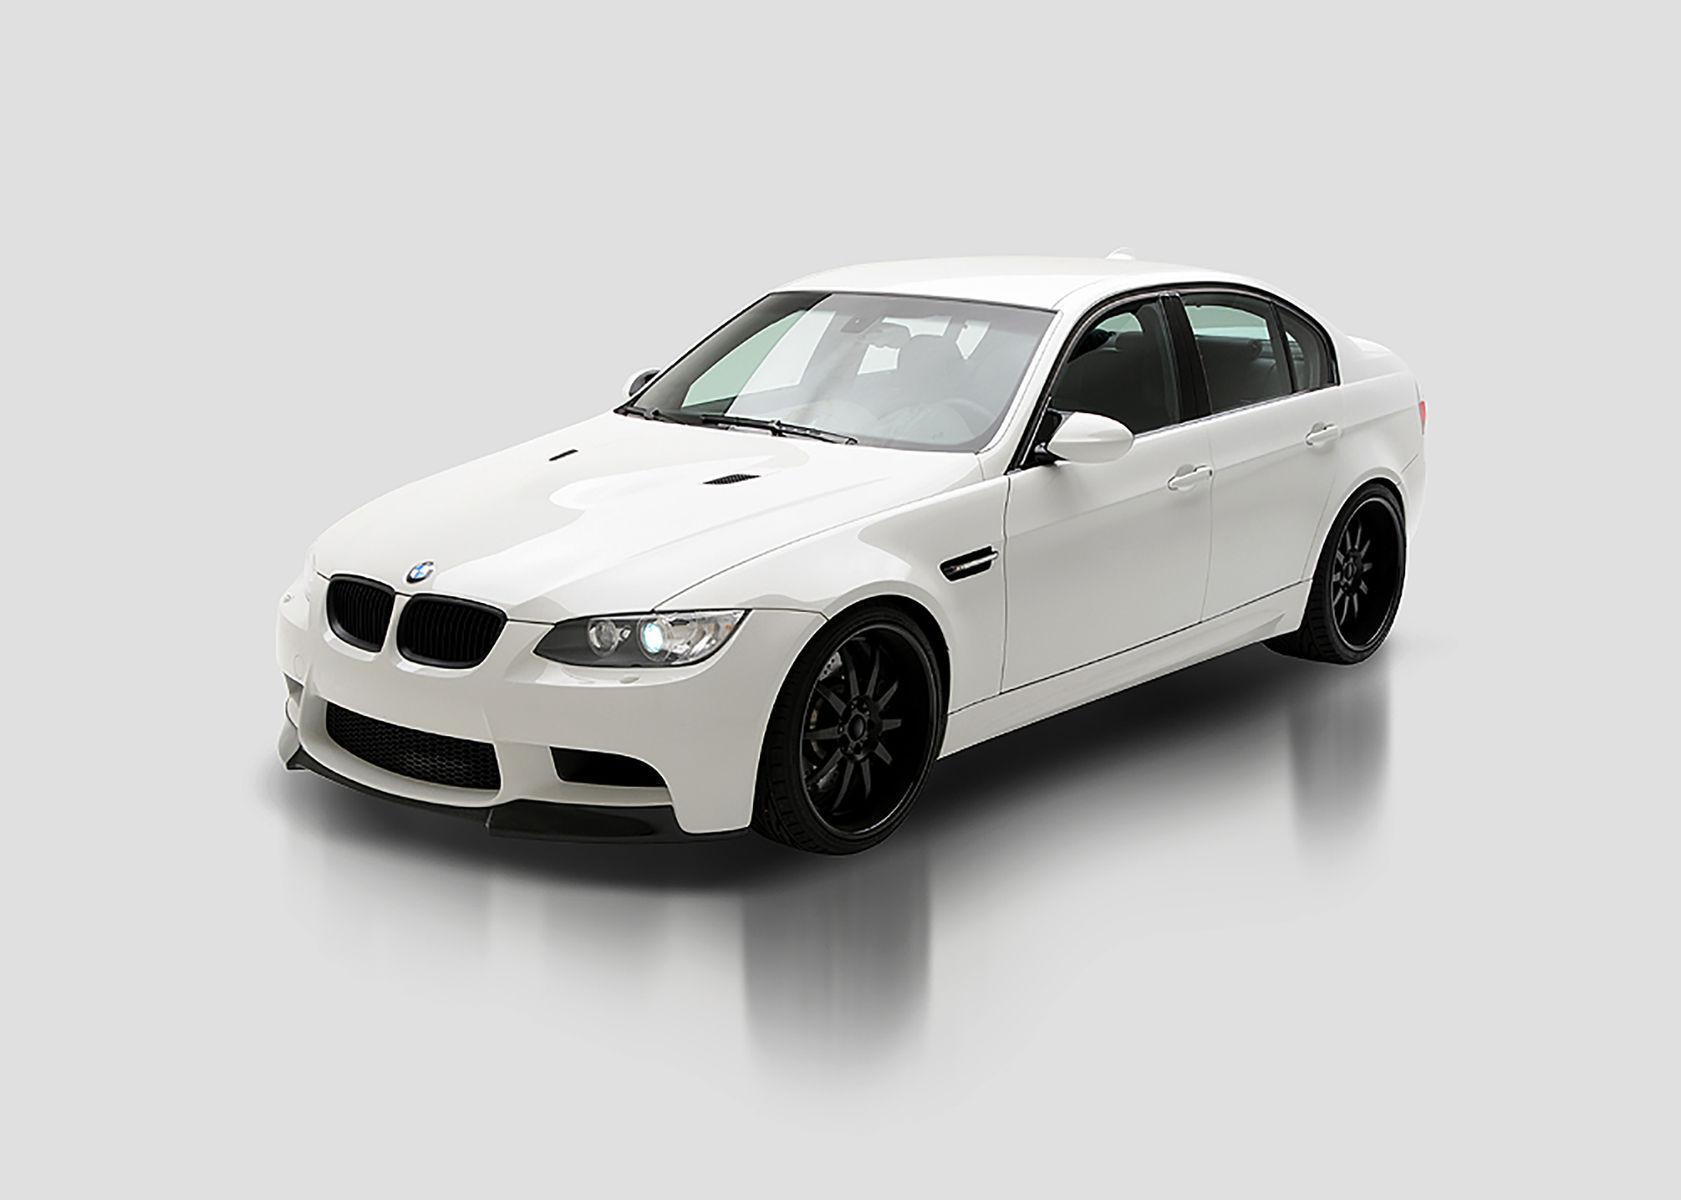 2013 BMW M3 | BMW M3